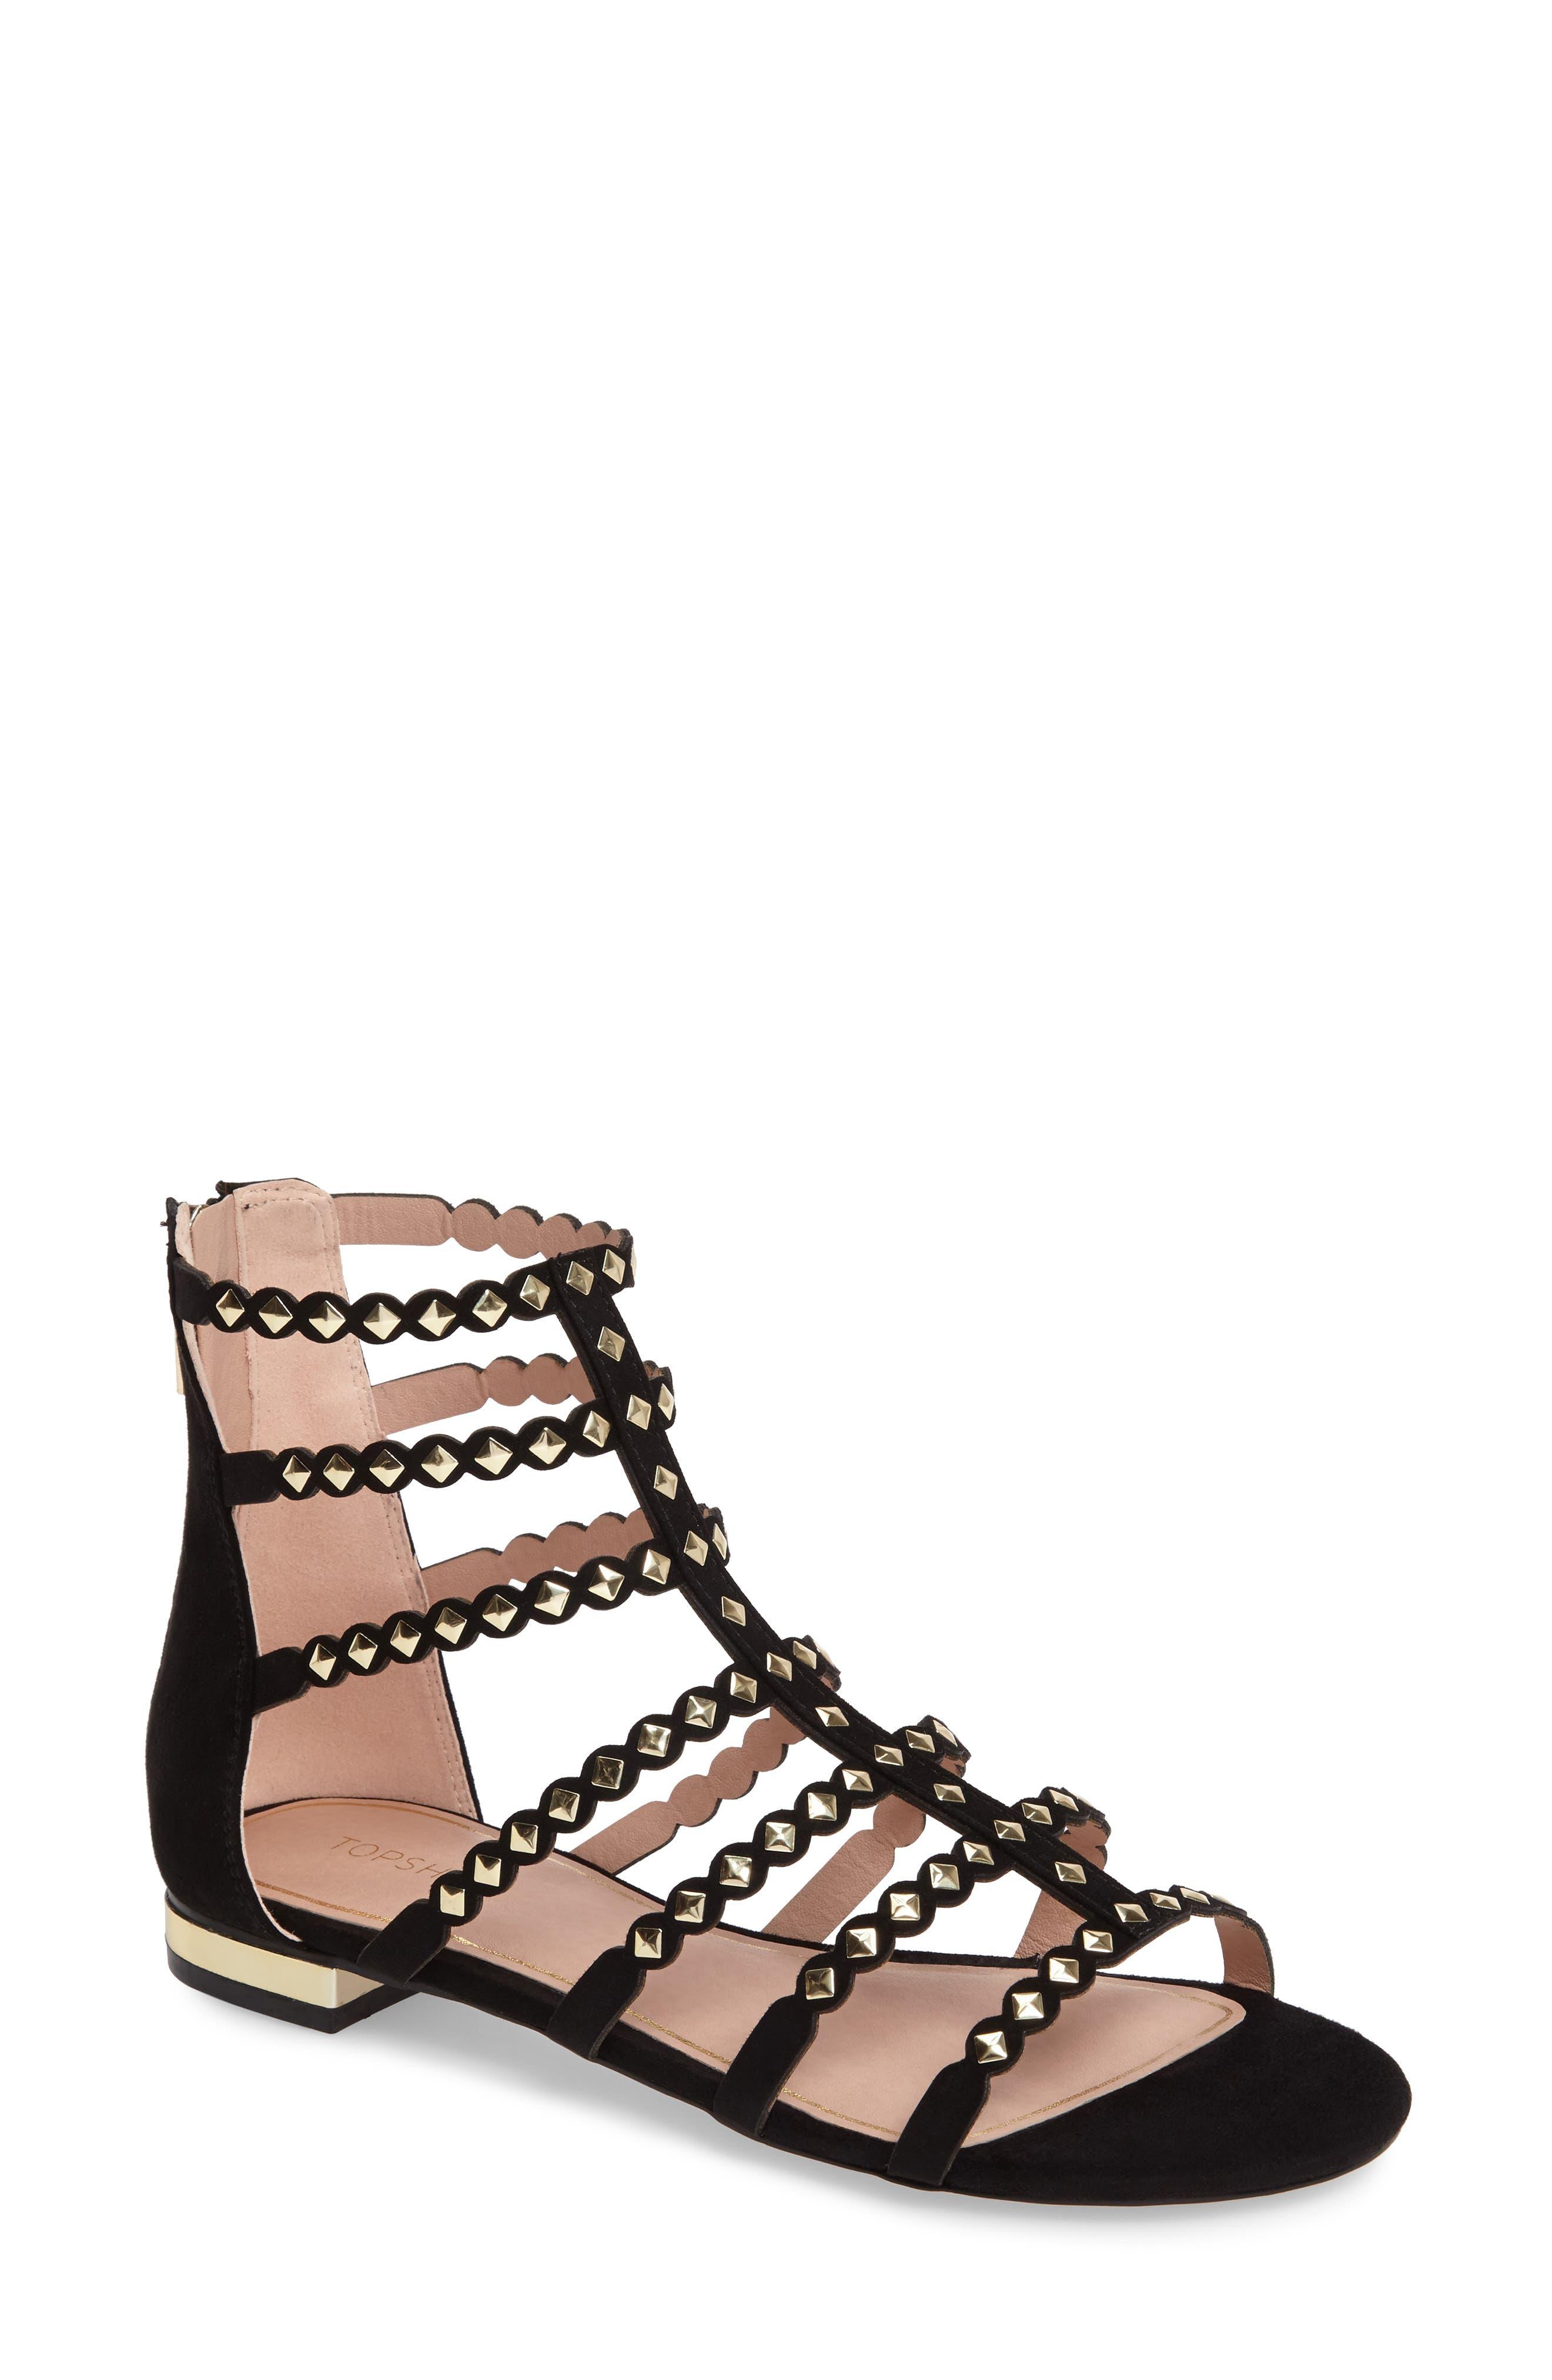 Alternate Image 1 Selected - Topshop Higher Stud Gladiator Sandal (Women)